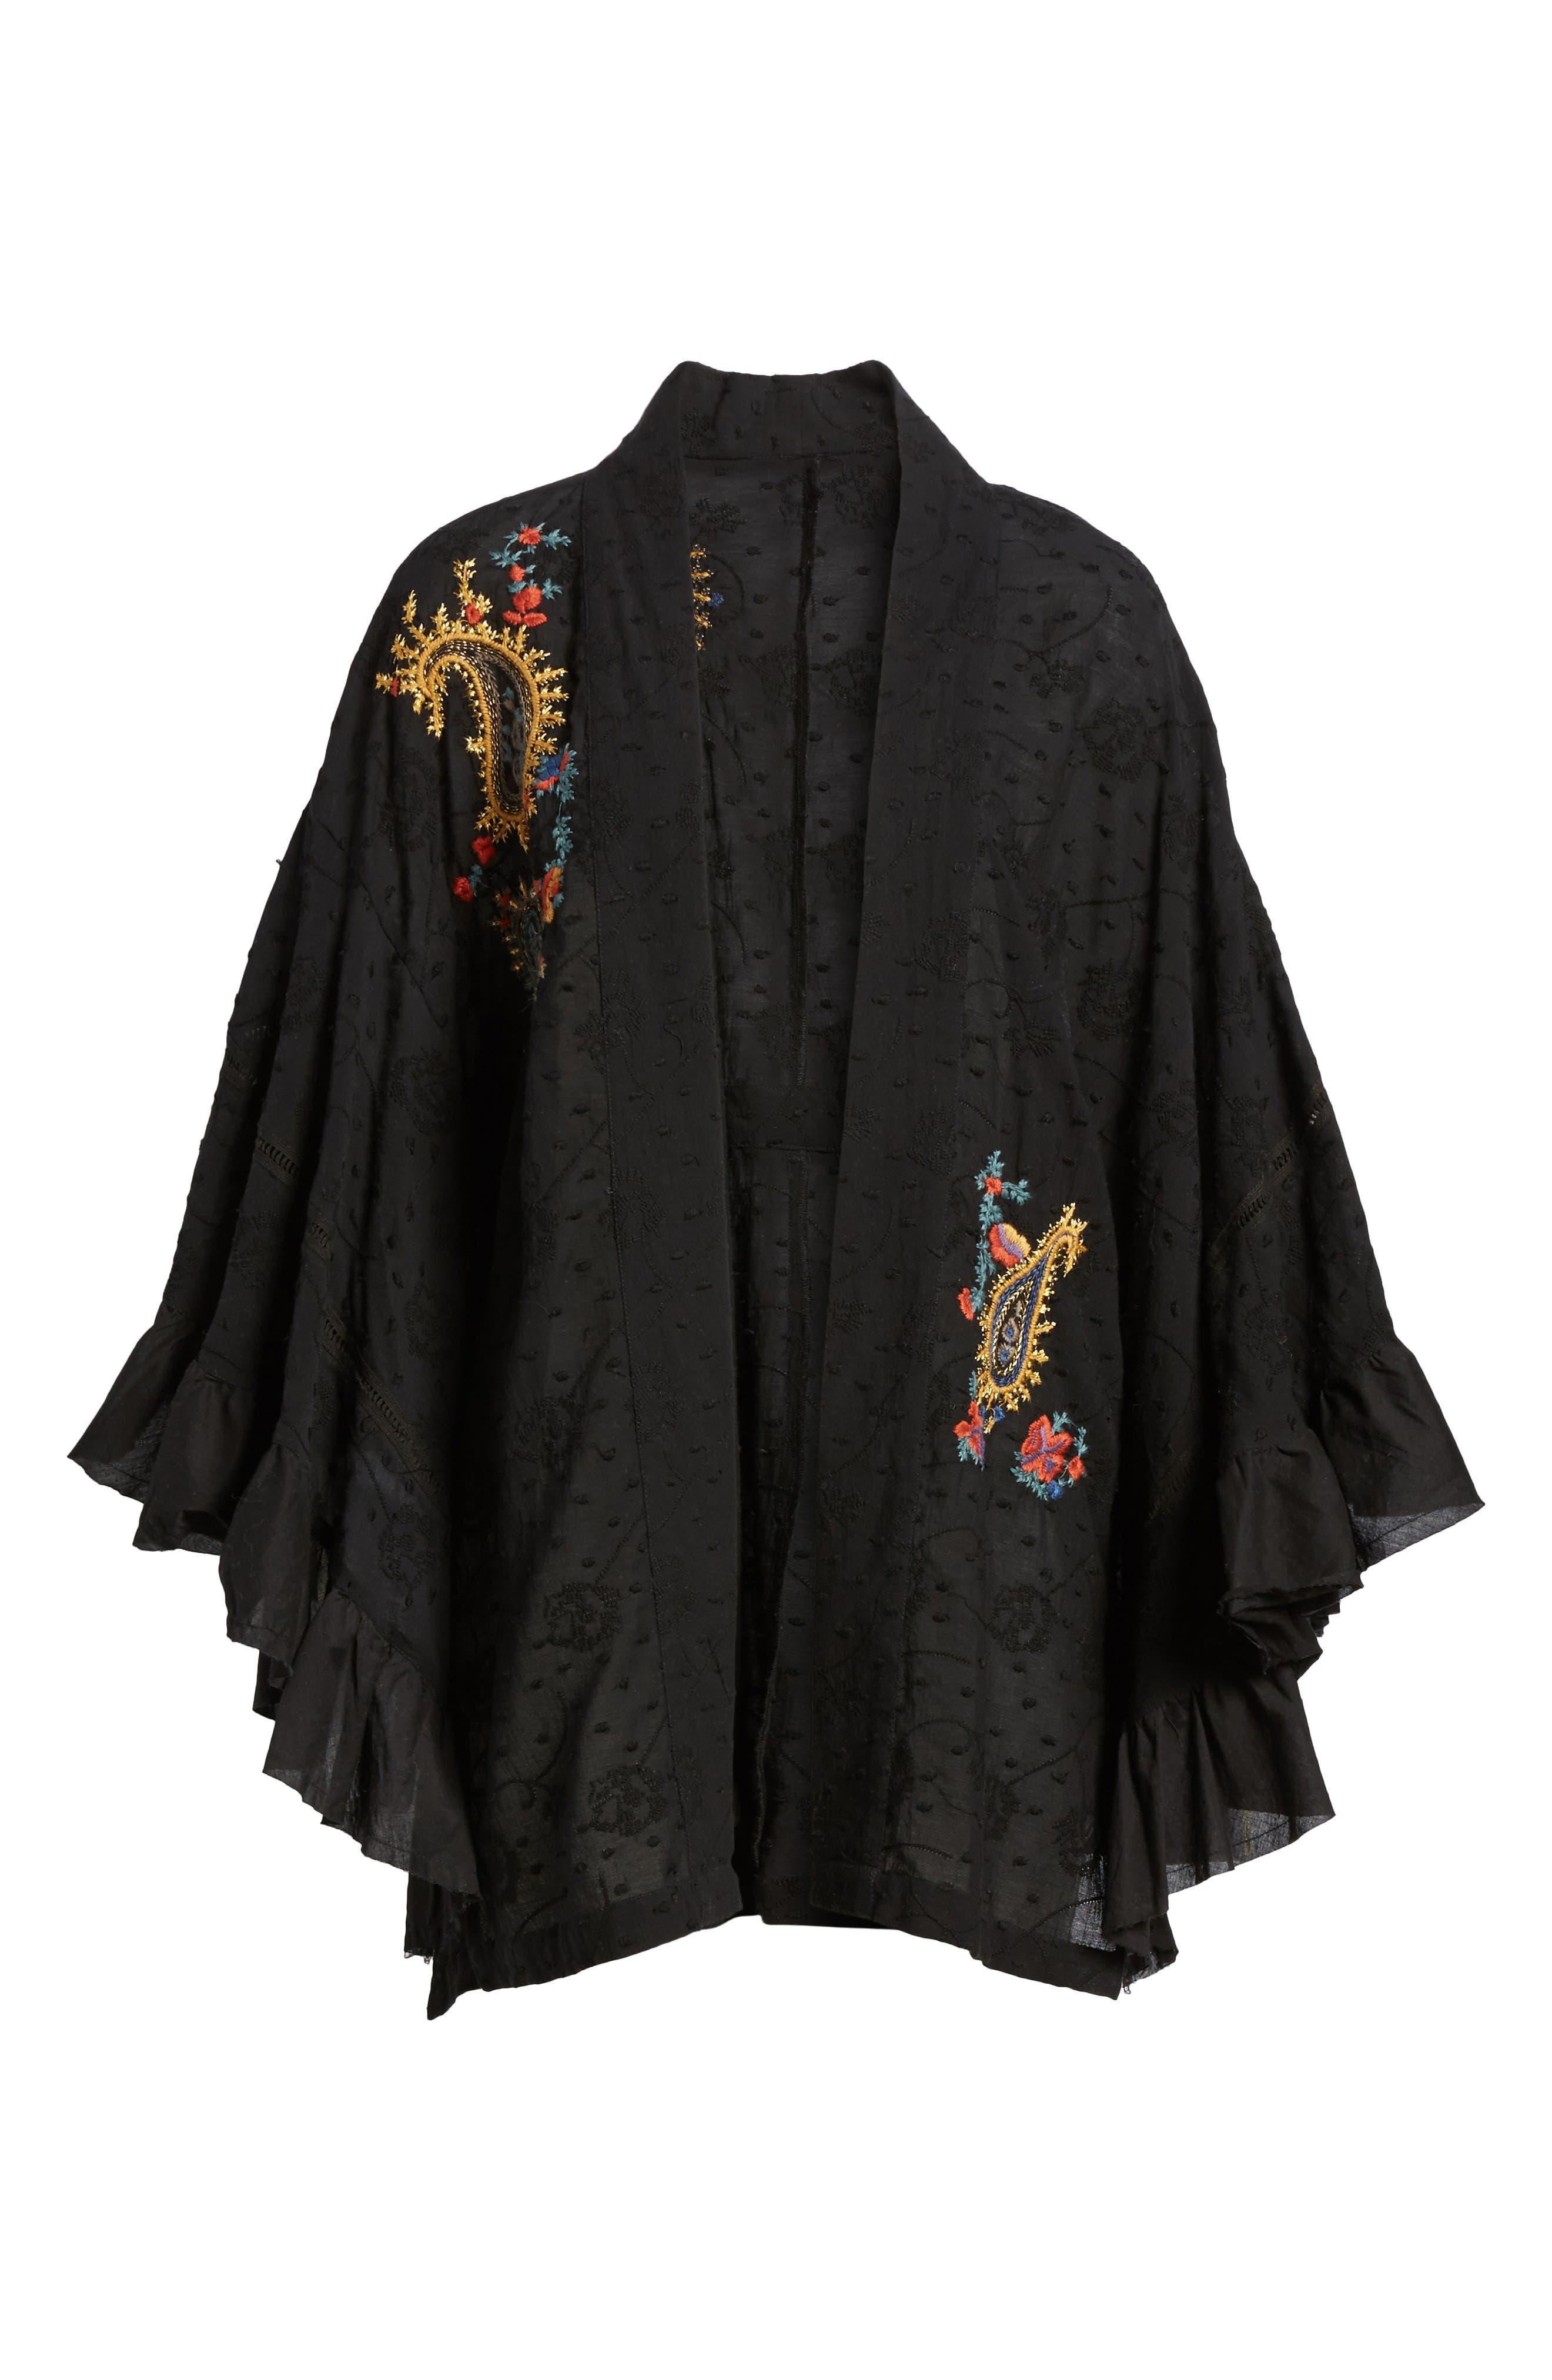 Dottie West Kimono,                             Alternate thumbnail 6, color,                             BLACK